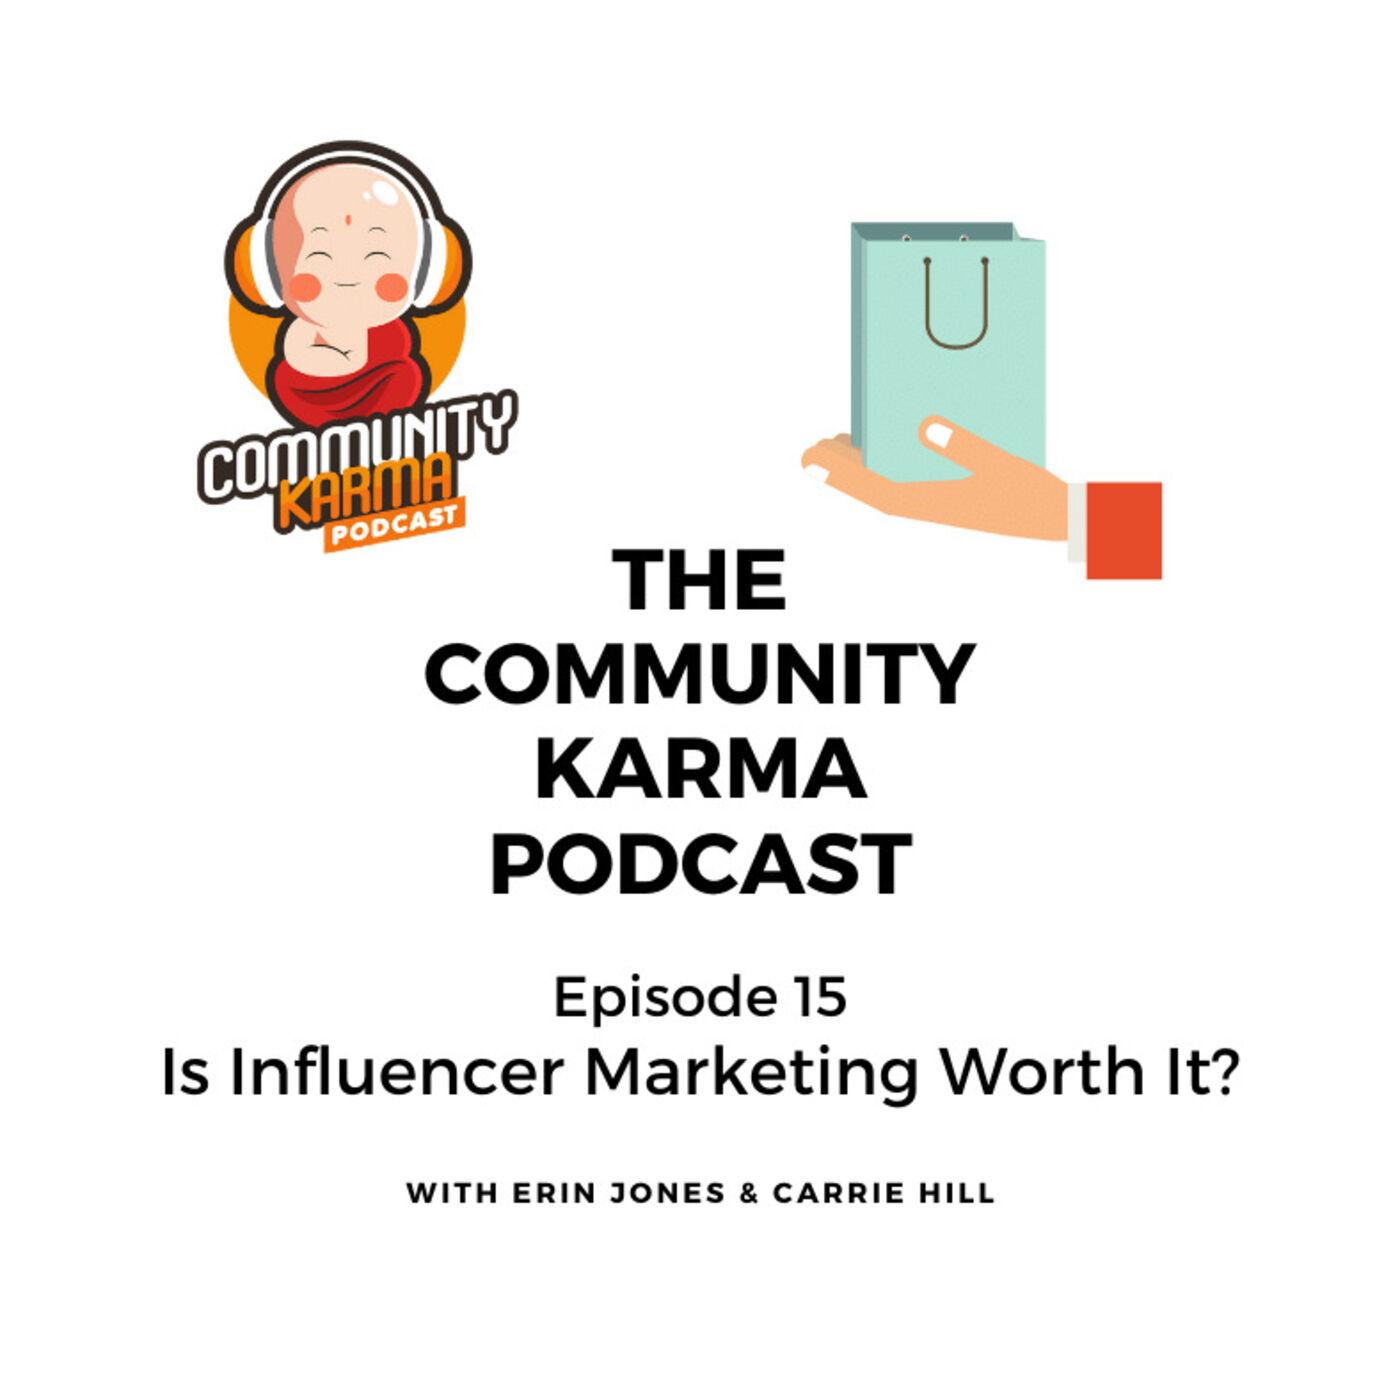 Episode 15: Is Influencer Marketing Worth It?